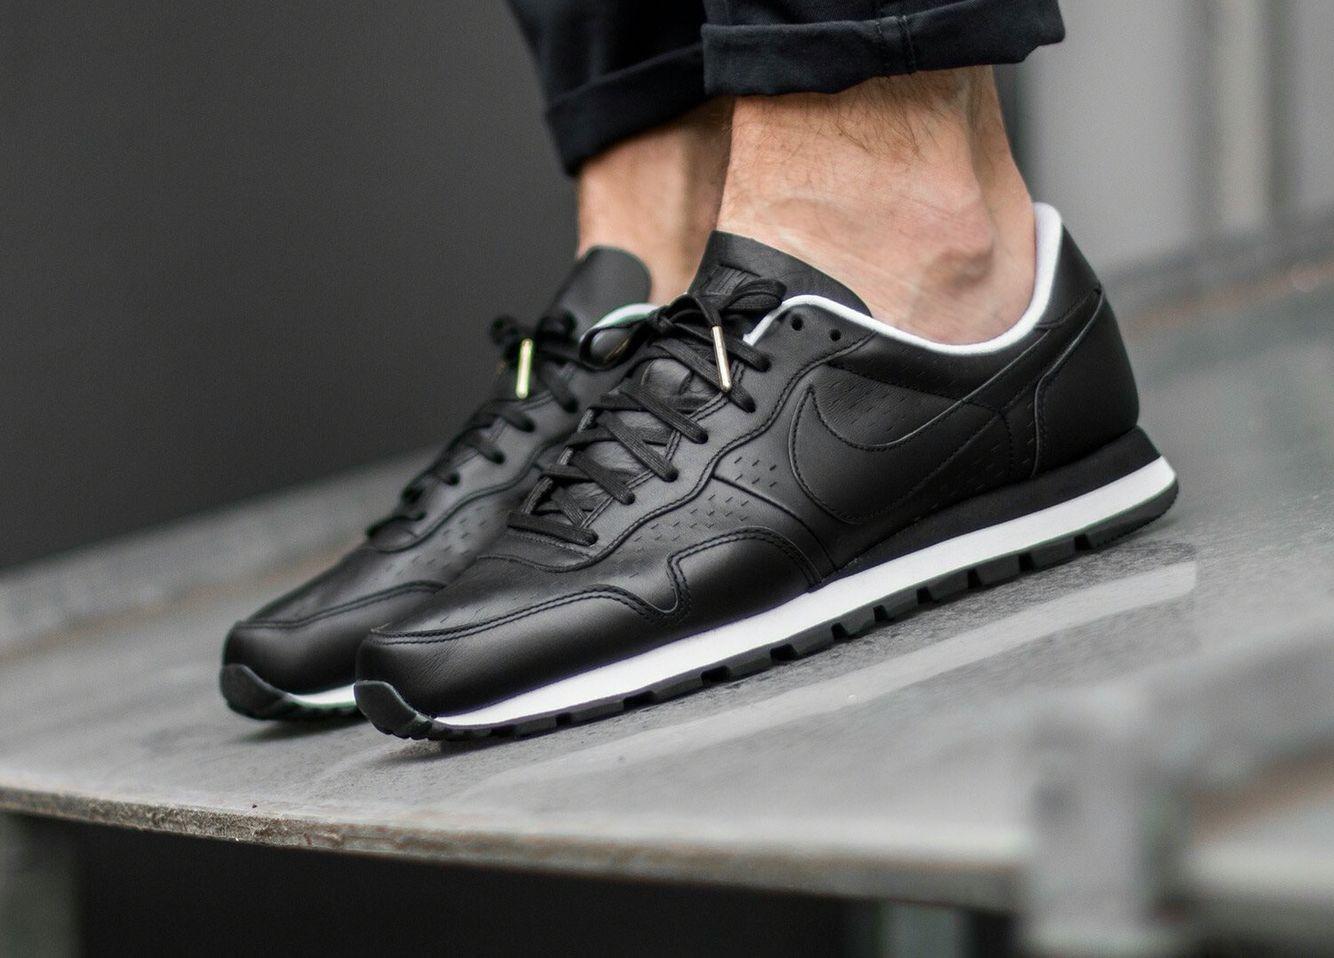 Nike Air Pegasus 83 Premium Leather: Black